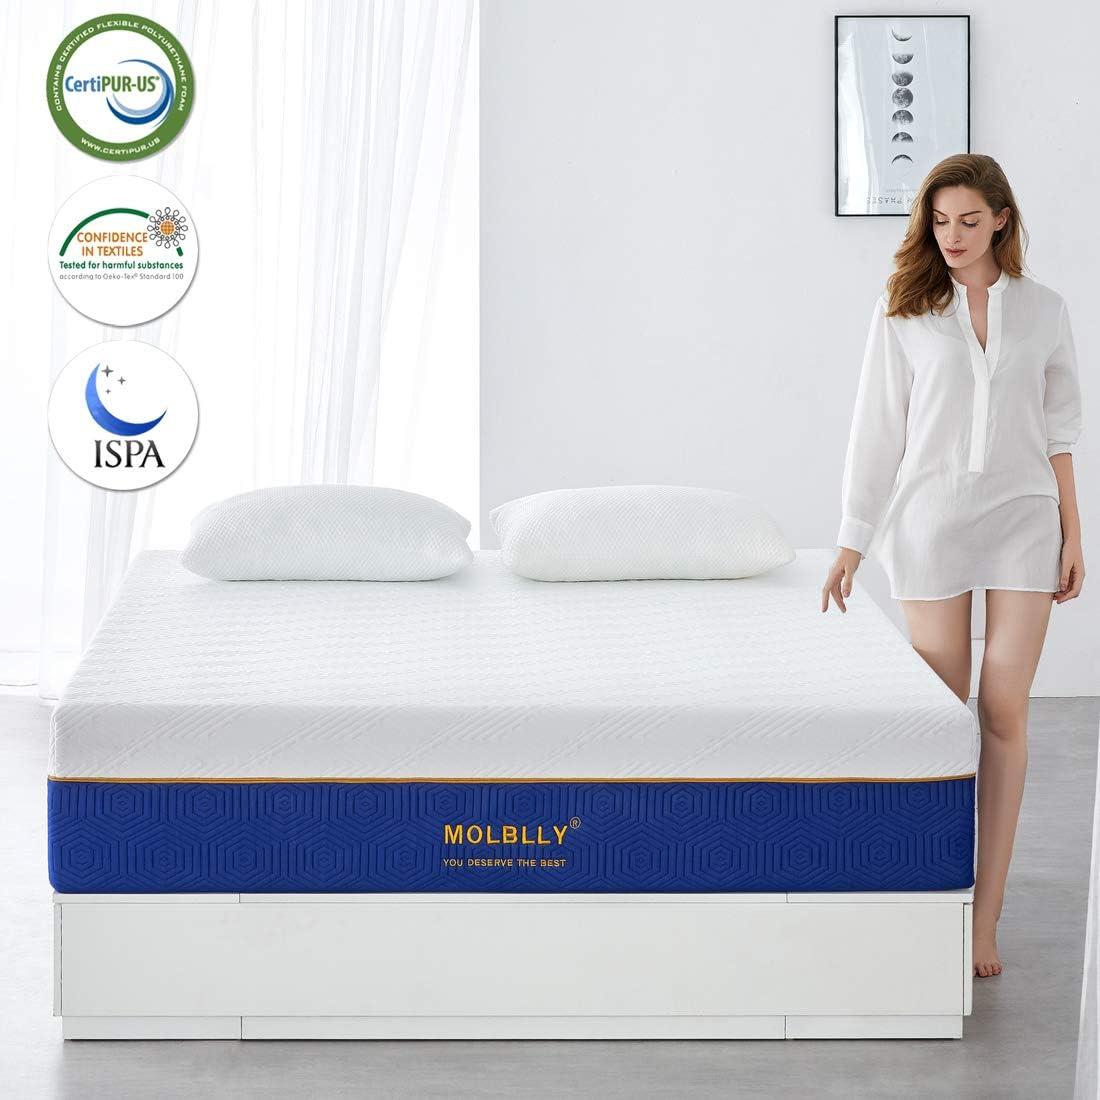 18CM Gel Memory Foam Mattress with CertiPUR-US Certified Foam Bed Mattress in a Box for Sleep Cooler /& Pressure Relief,90x190x18CM Molblly Single Mattress